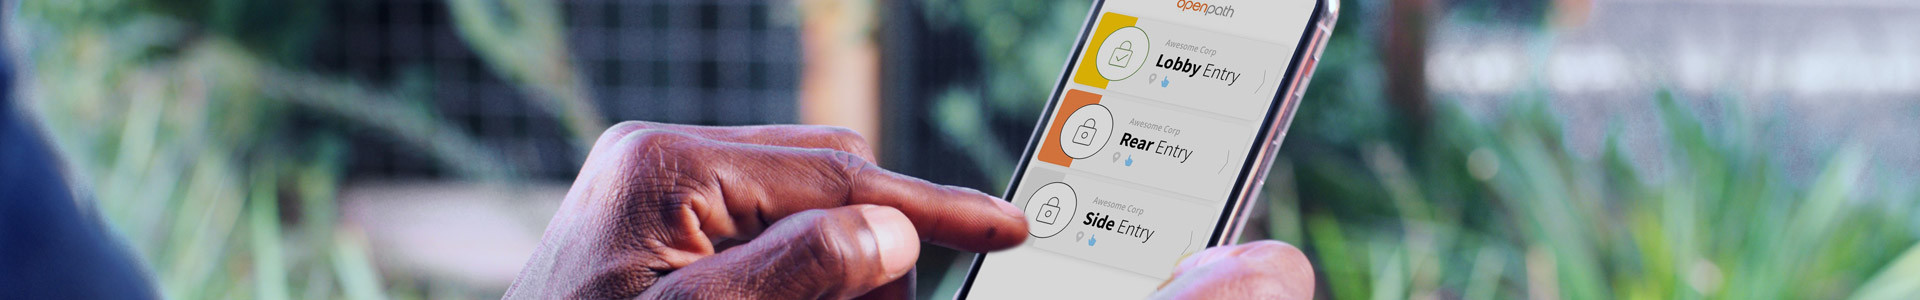 Openpath phone app